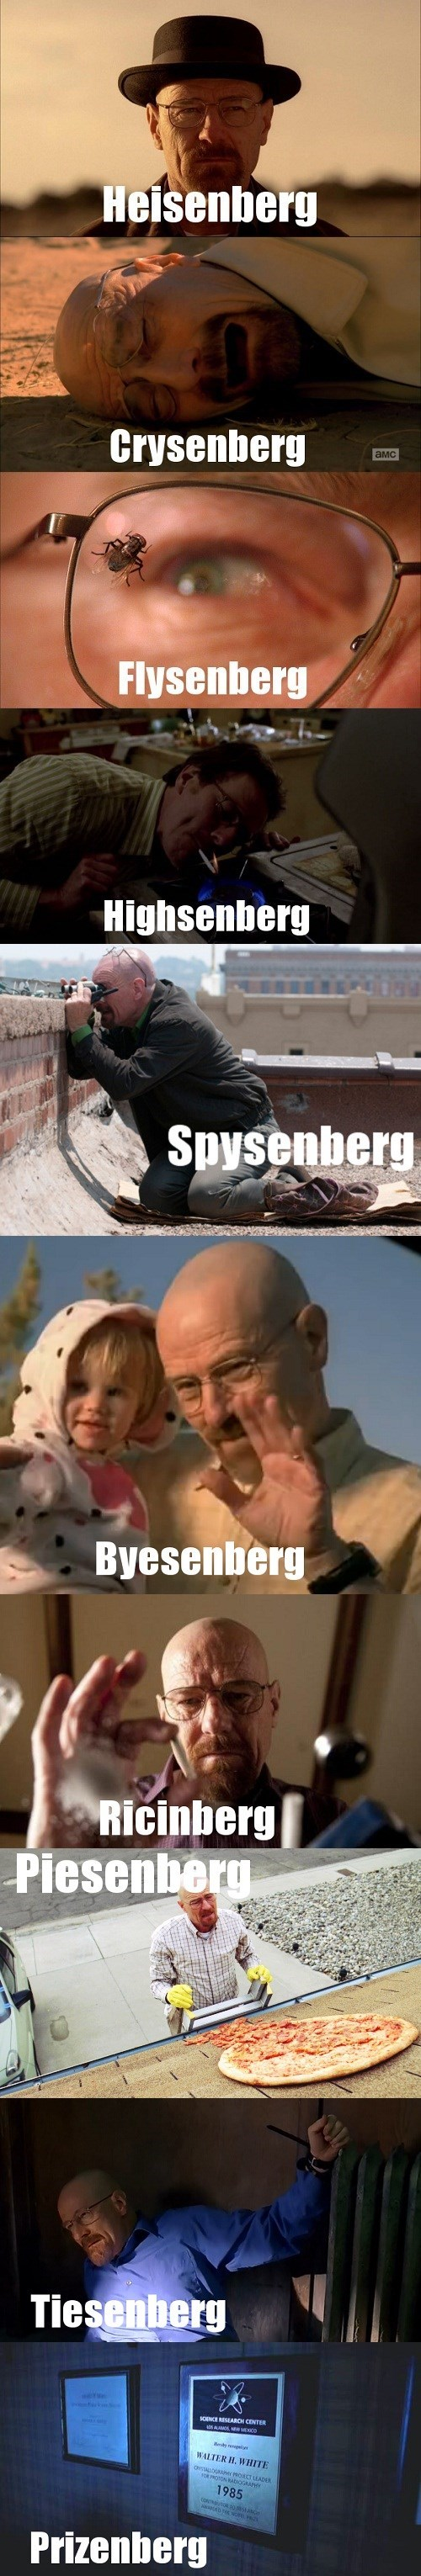 breaking bad heisenberg tv shows - 7819746304